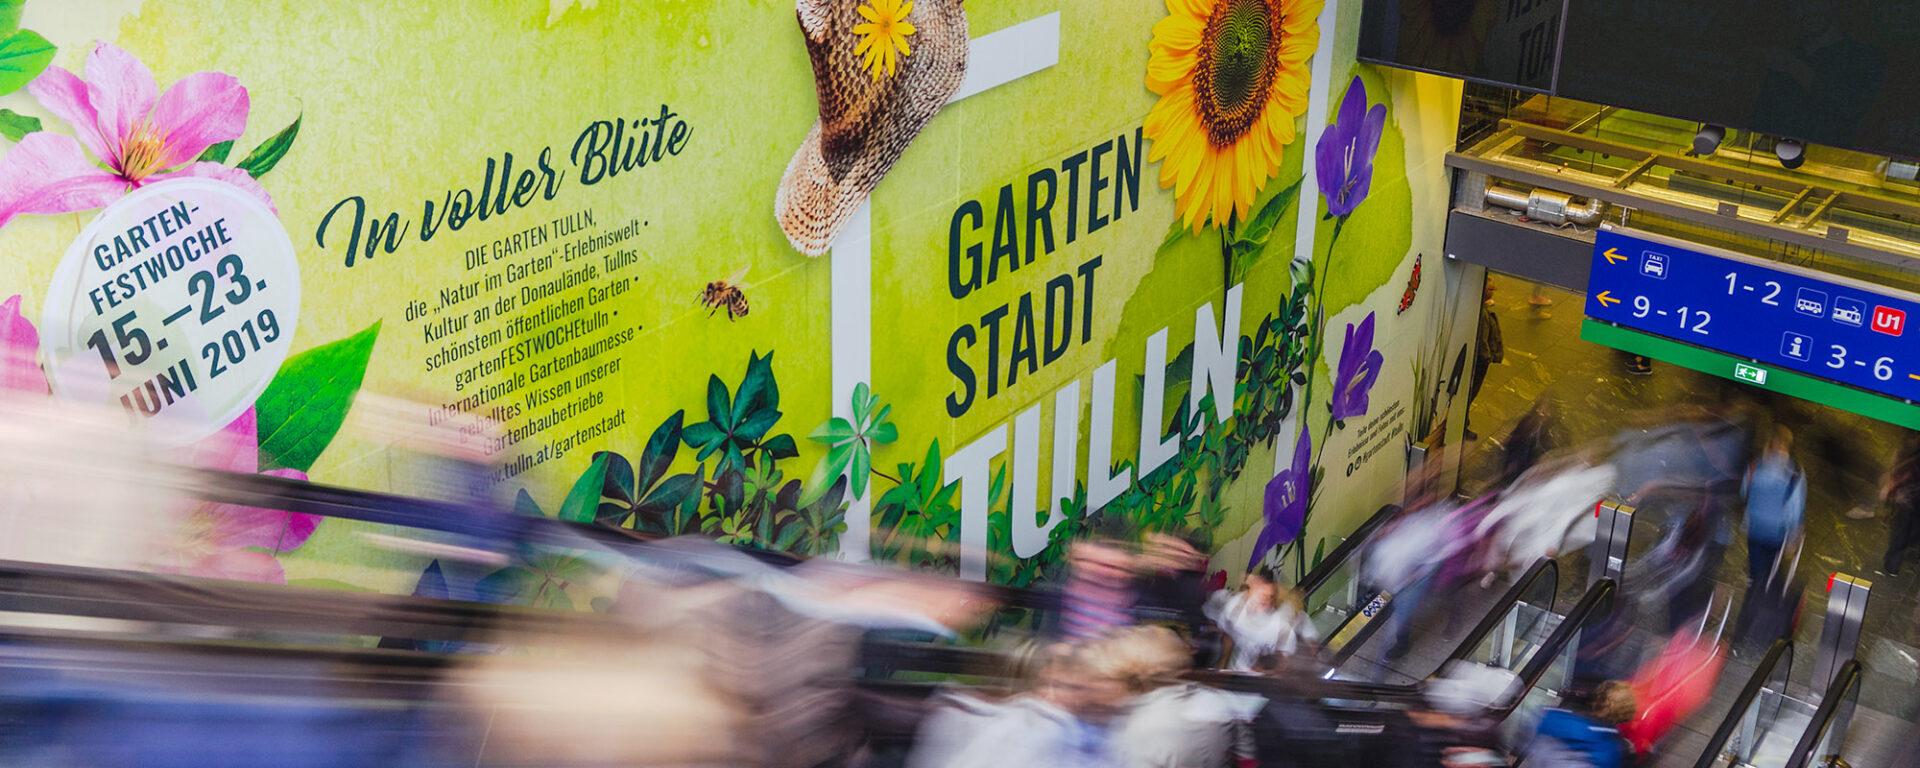 Rolltreppe am Wiener Hauptbahnhof